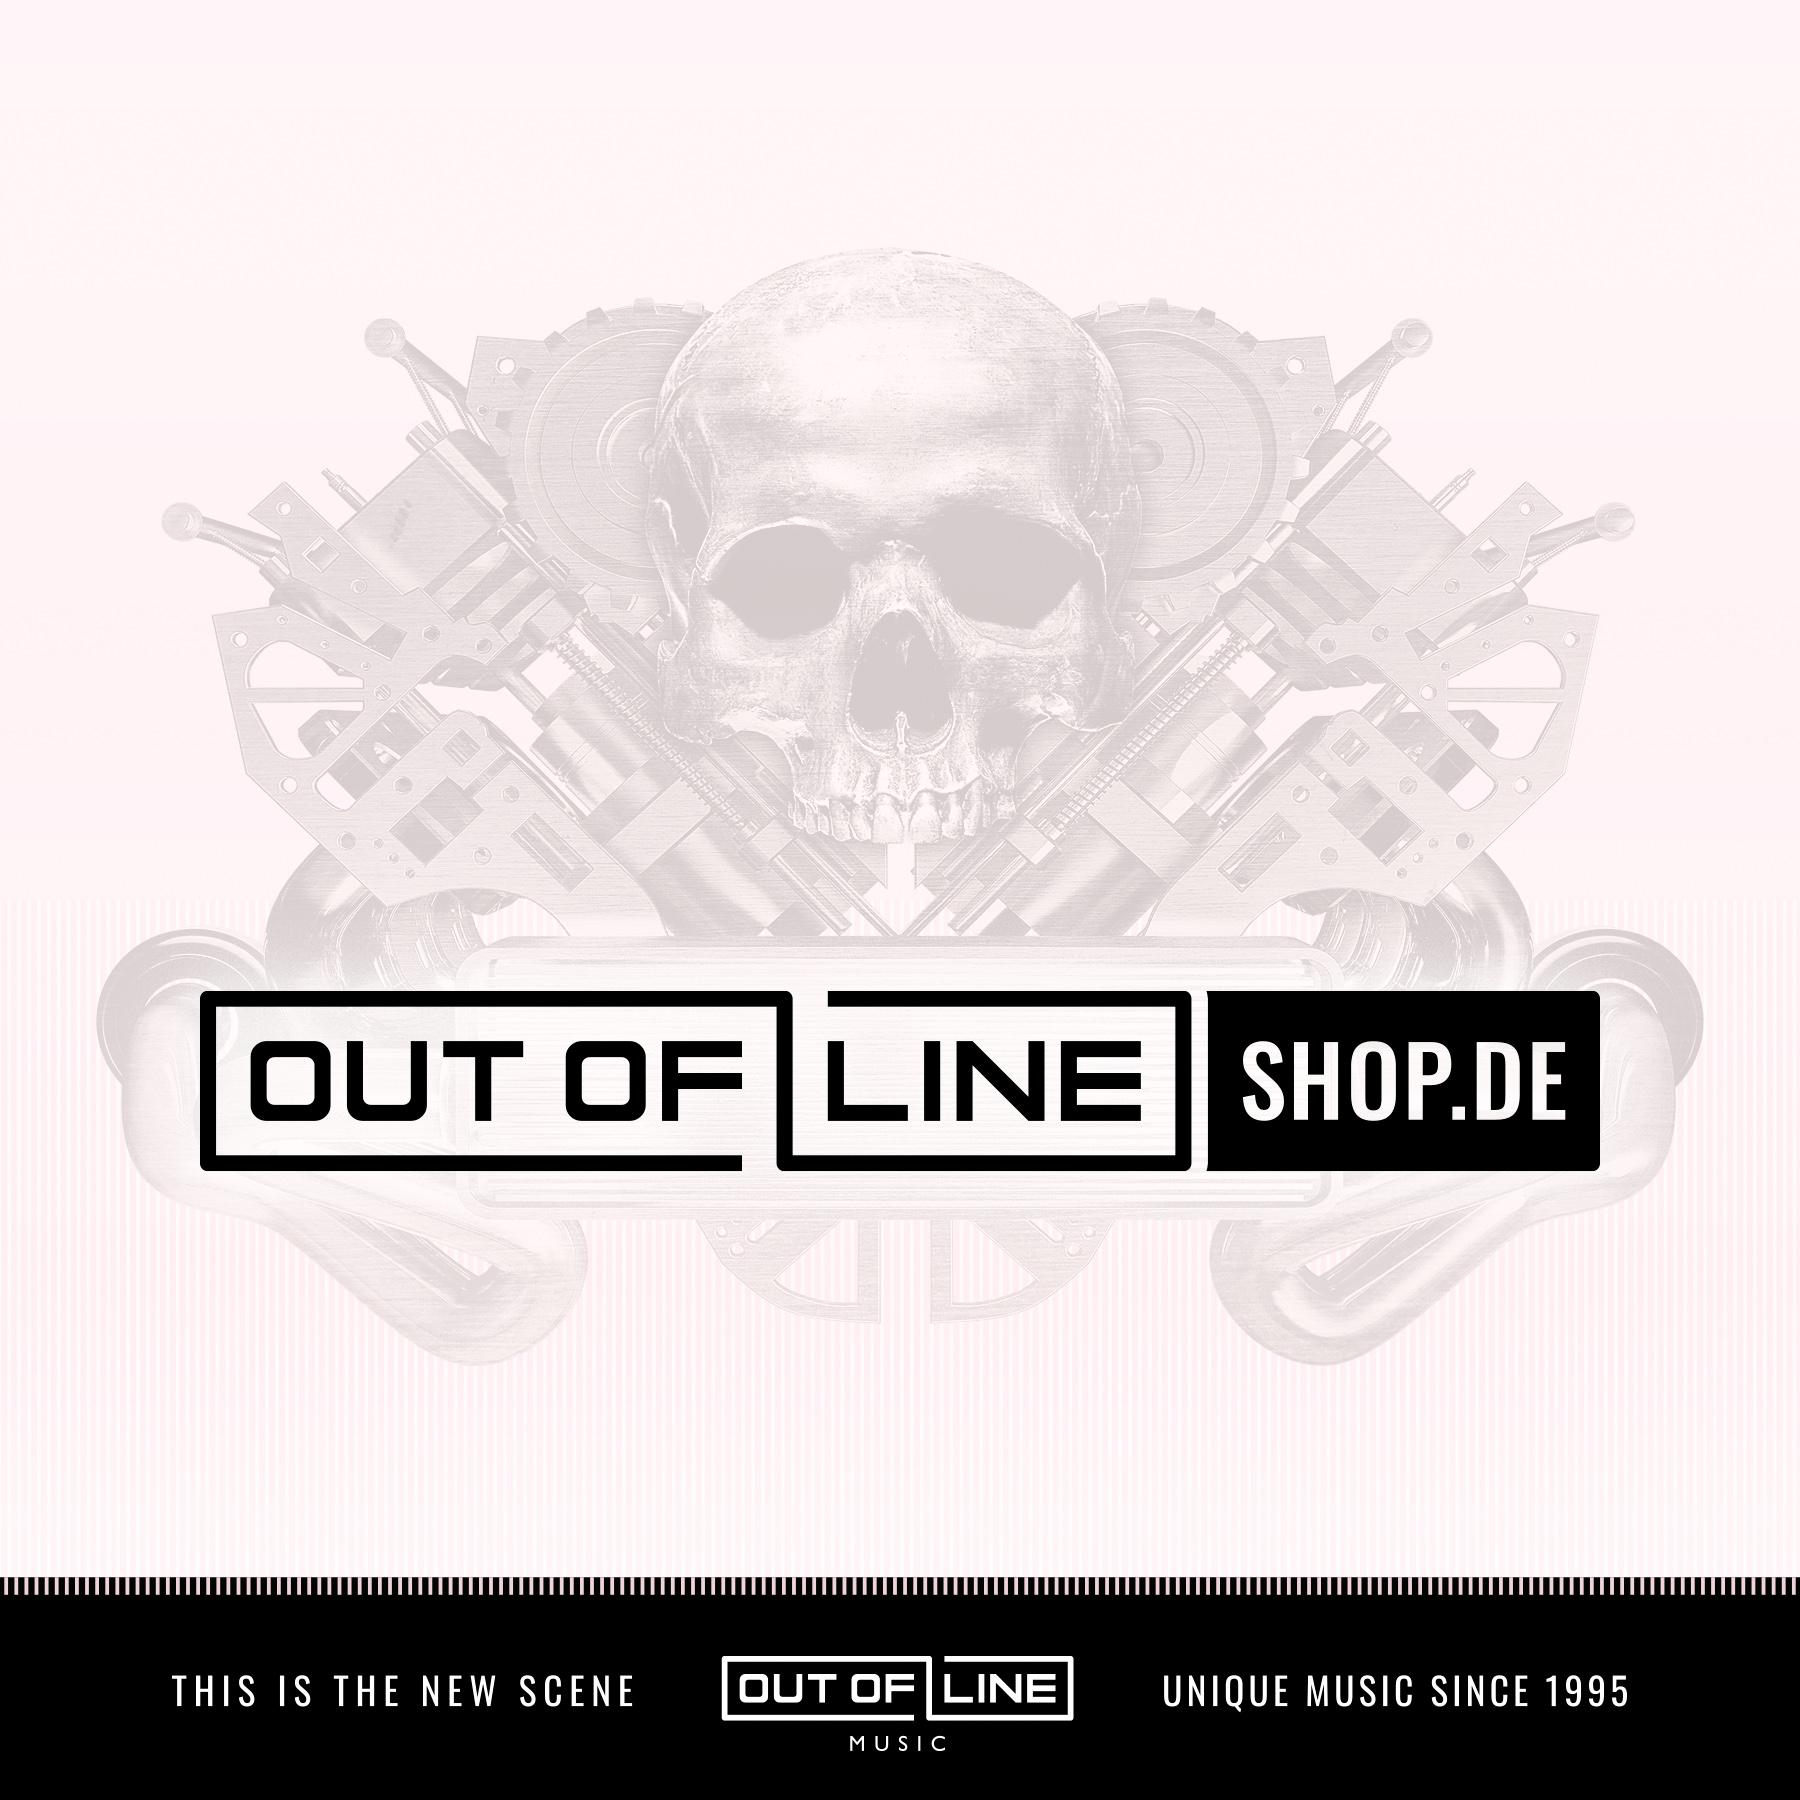 Unzucht - Kettenhund - Girlie - Girlie Shirt